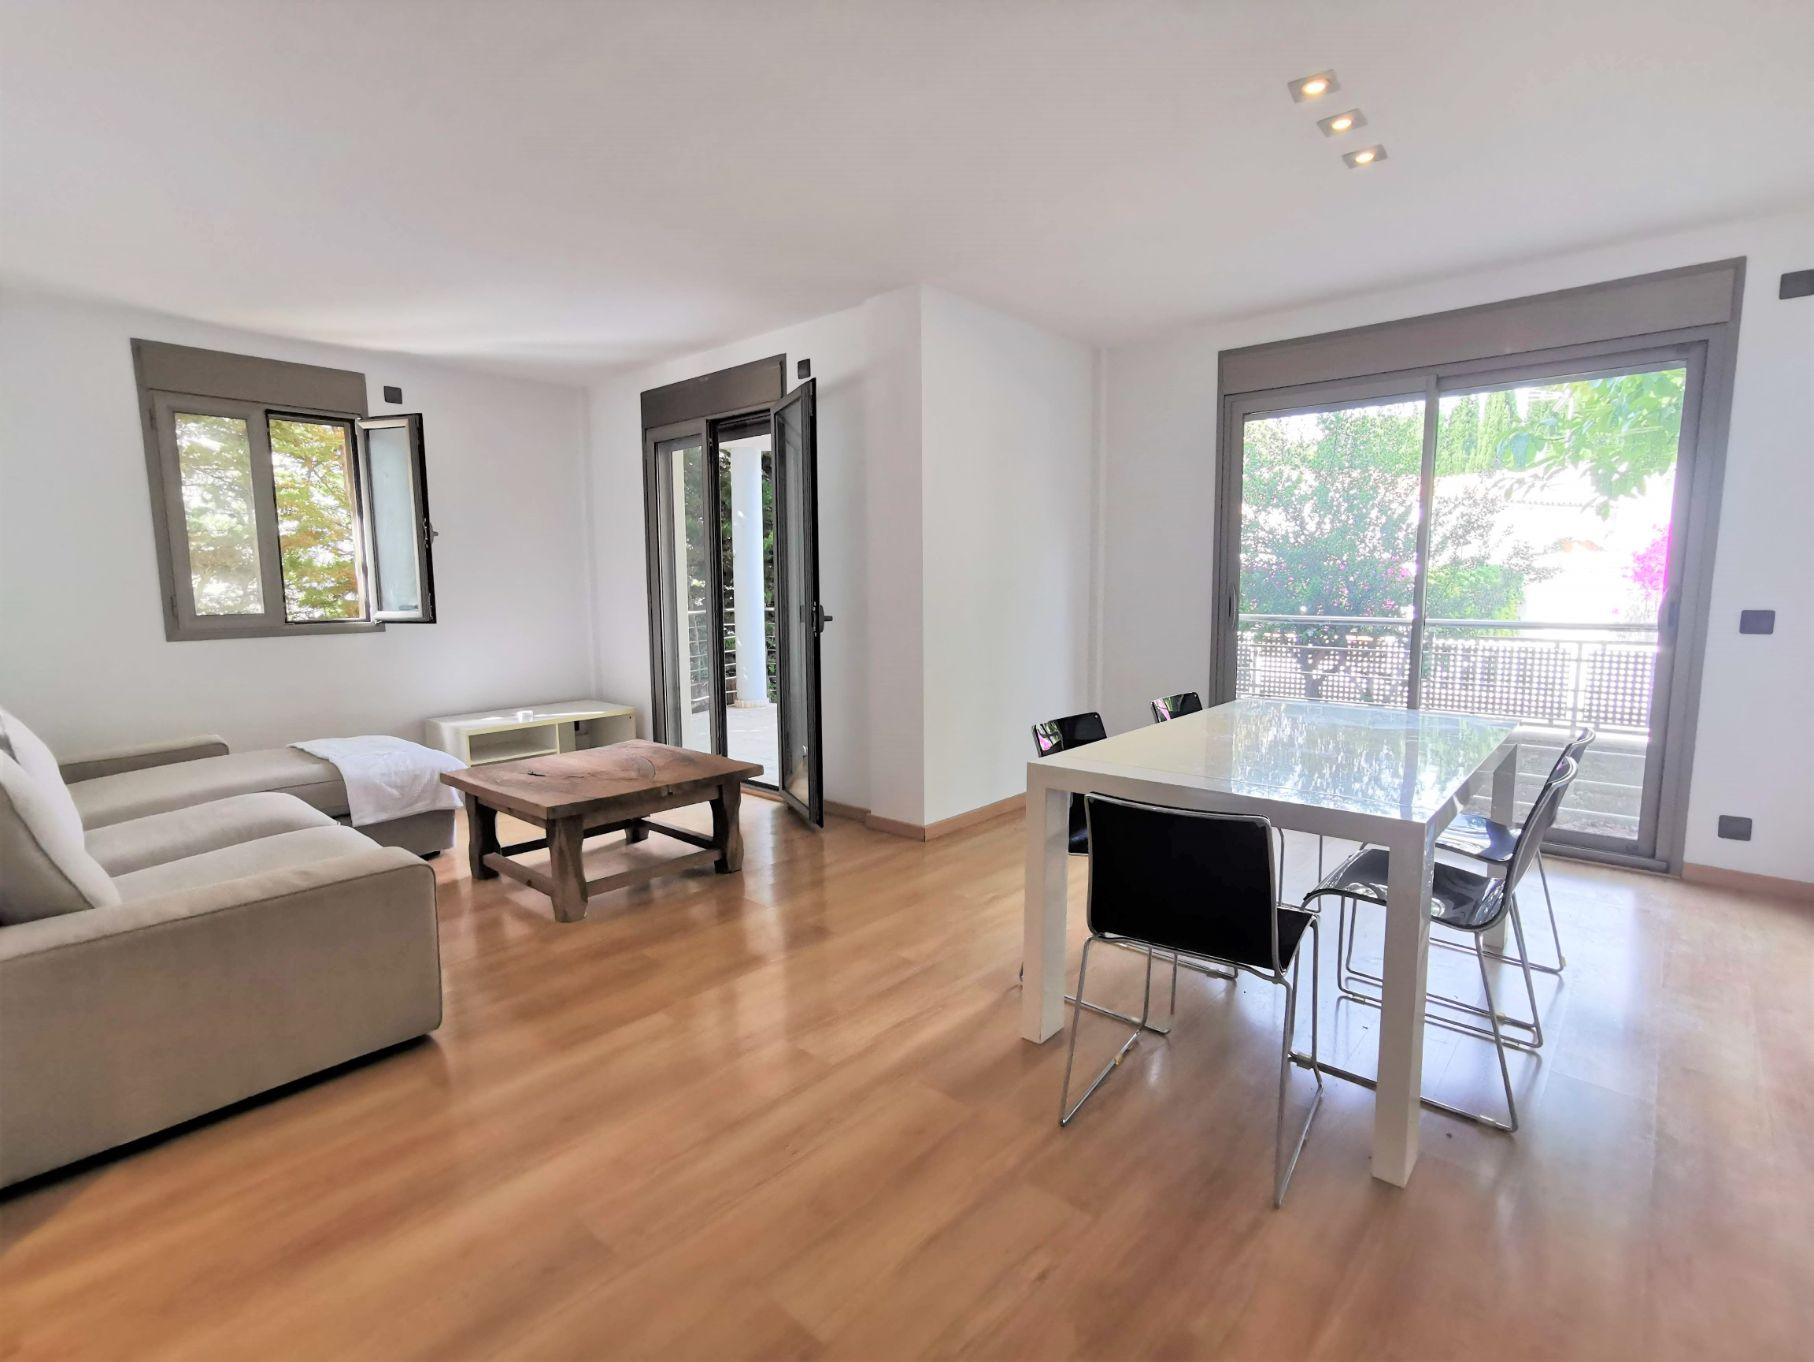 Spectacular modern duplex for sale close to beach Puerto Pollensa Mallorca